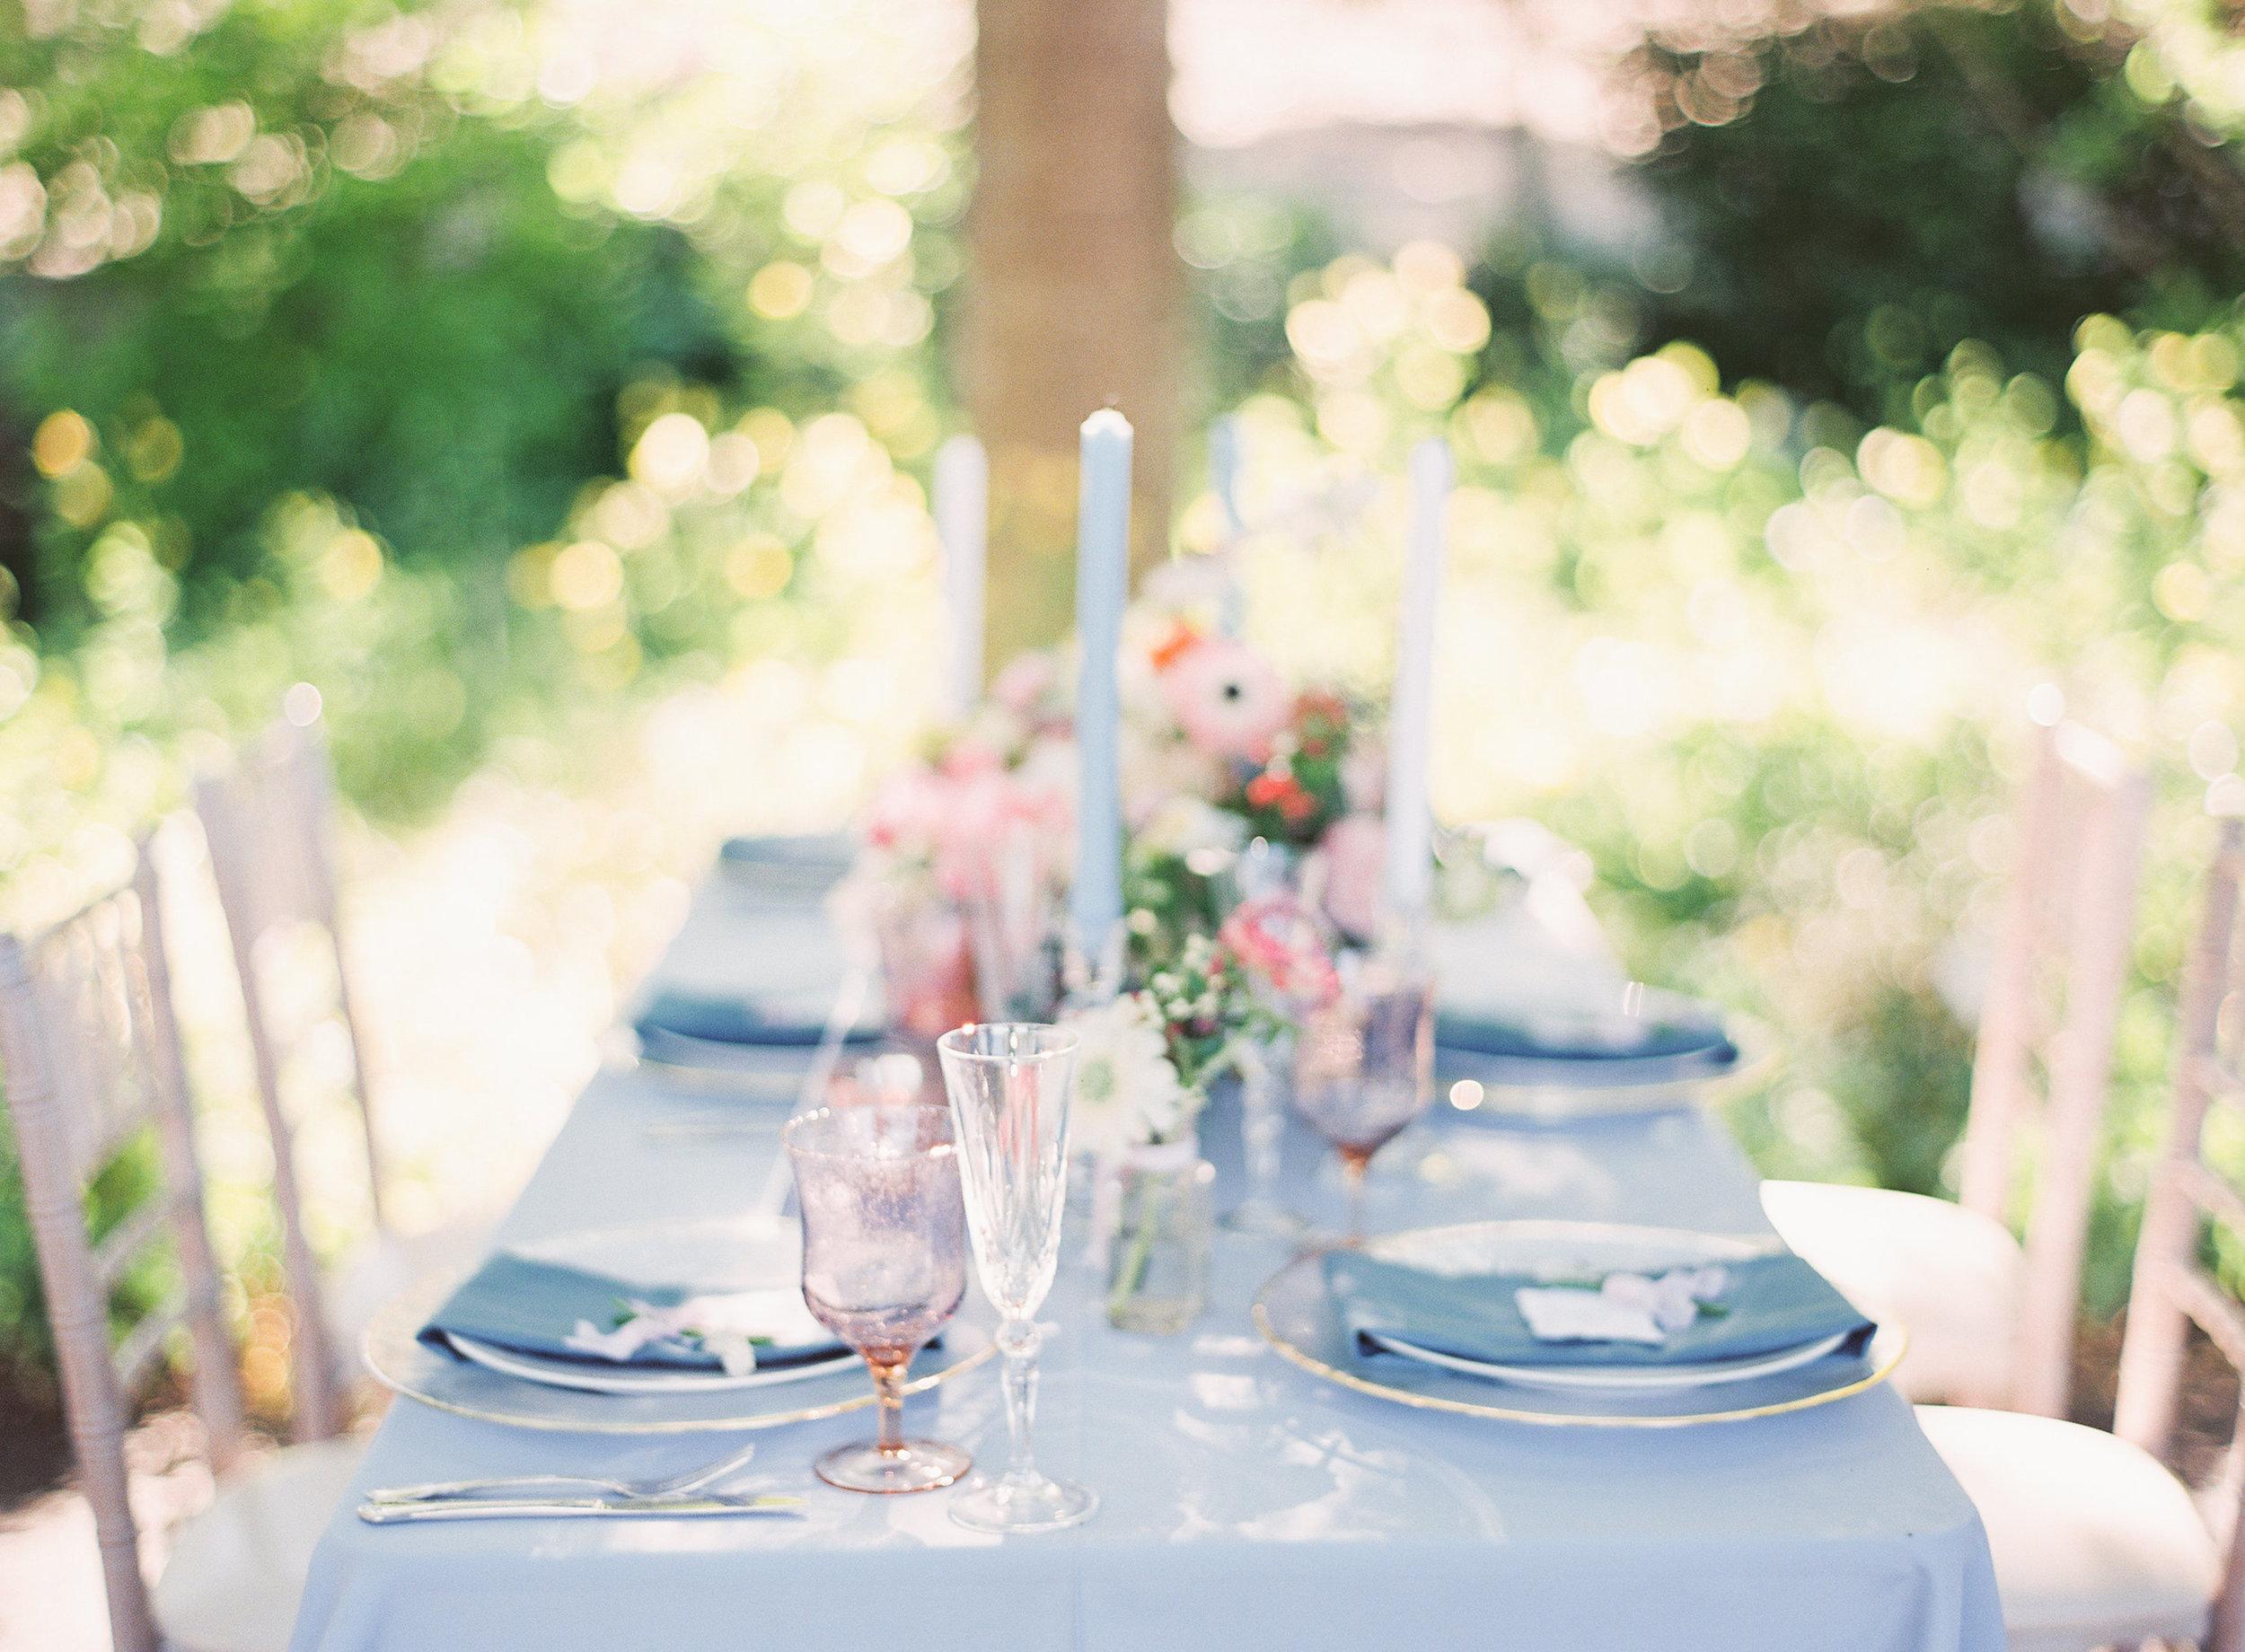 NathalieCheng_Monet_Styled_Shoot_Table_064.jpg